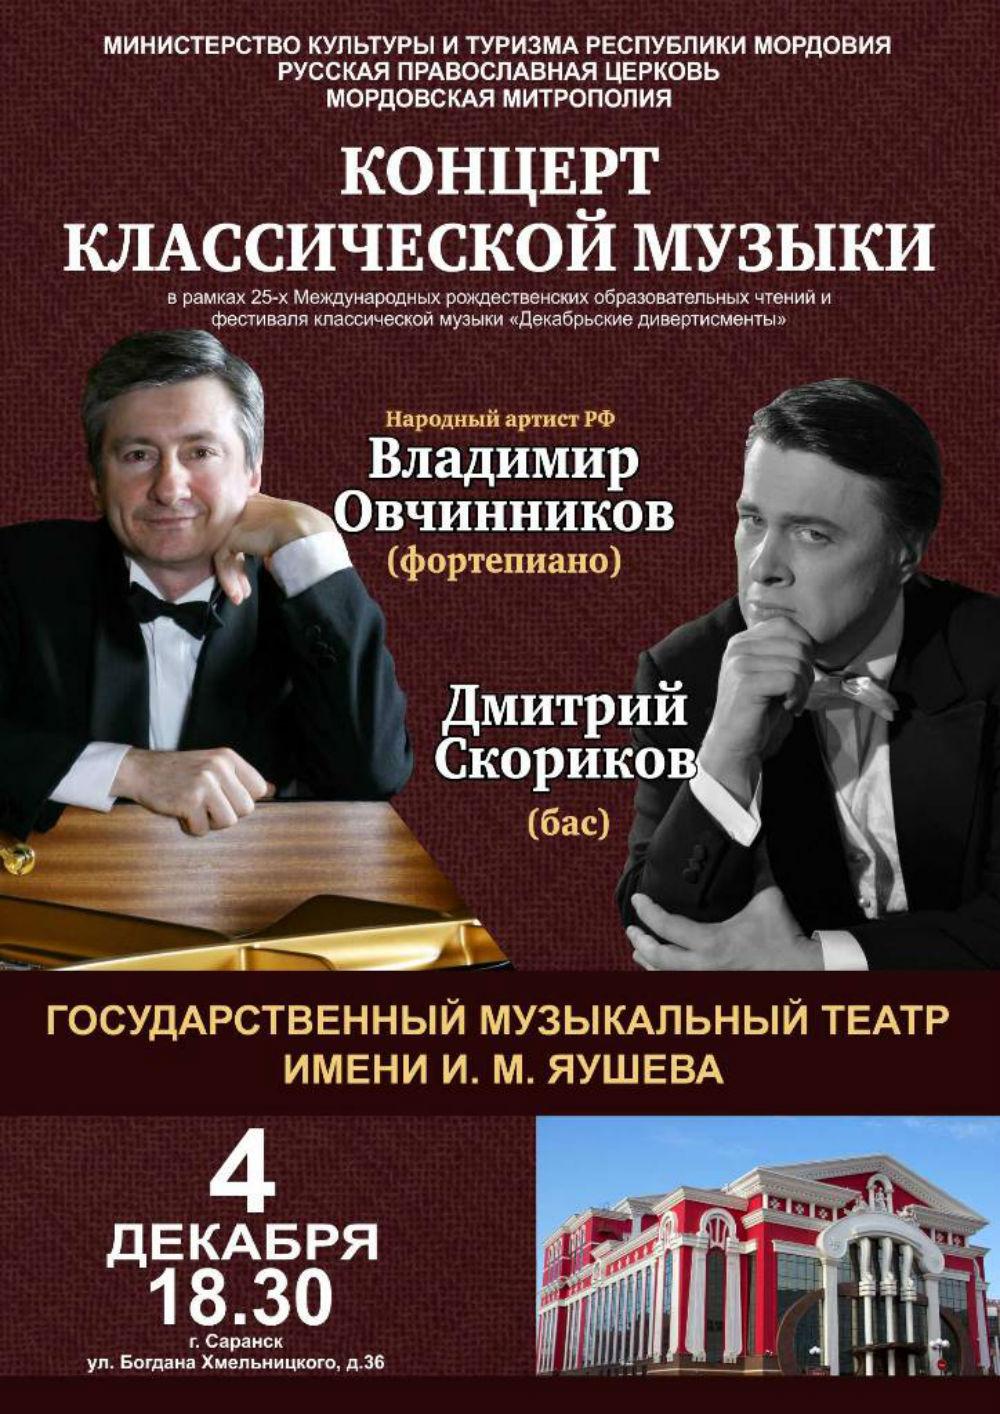 koncert_jaysheva